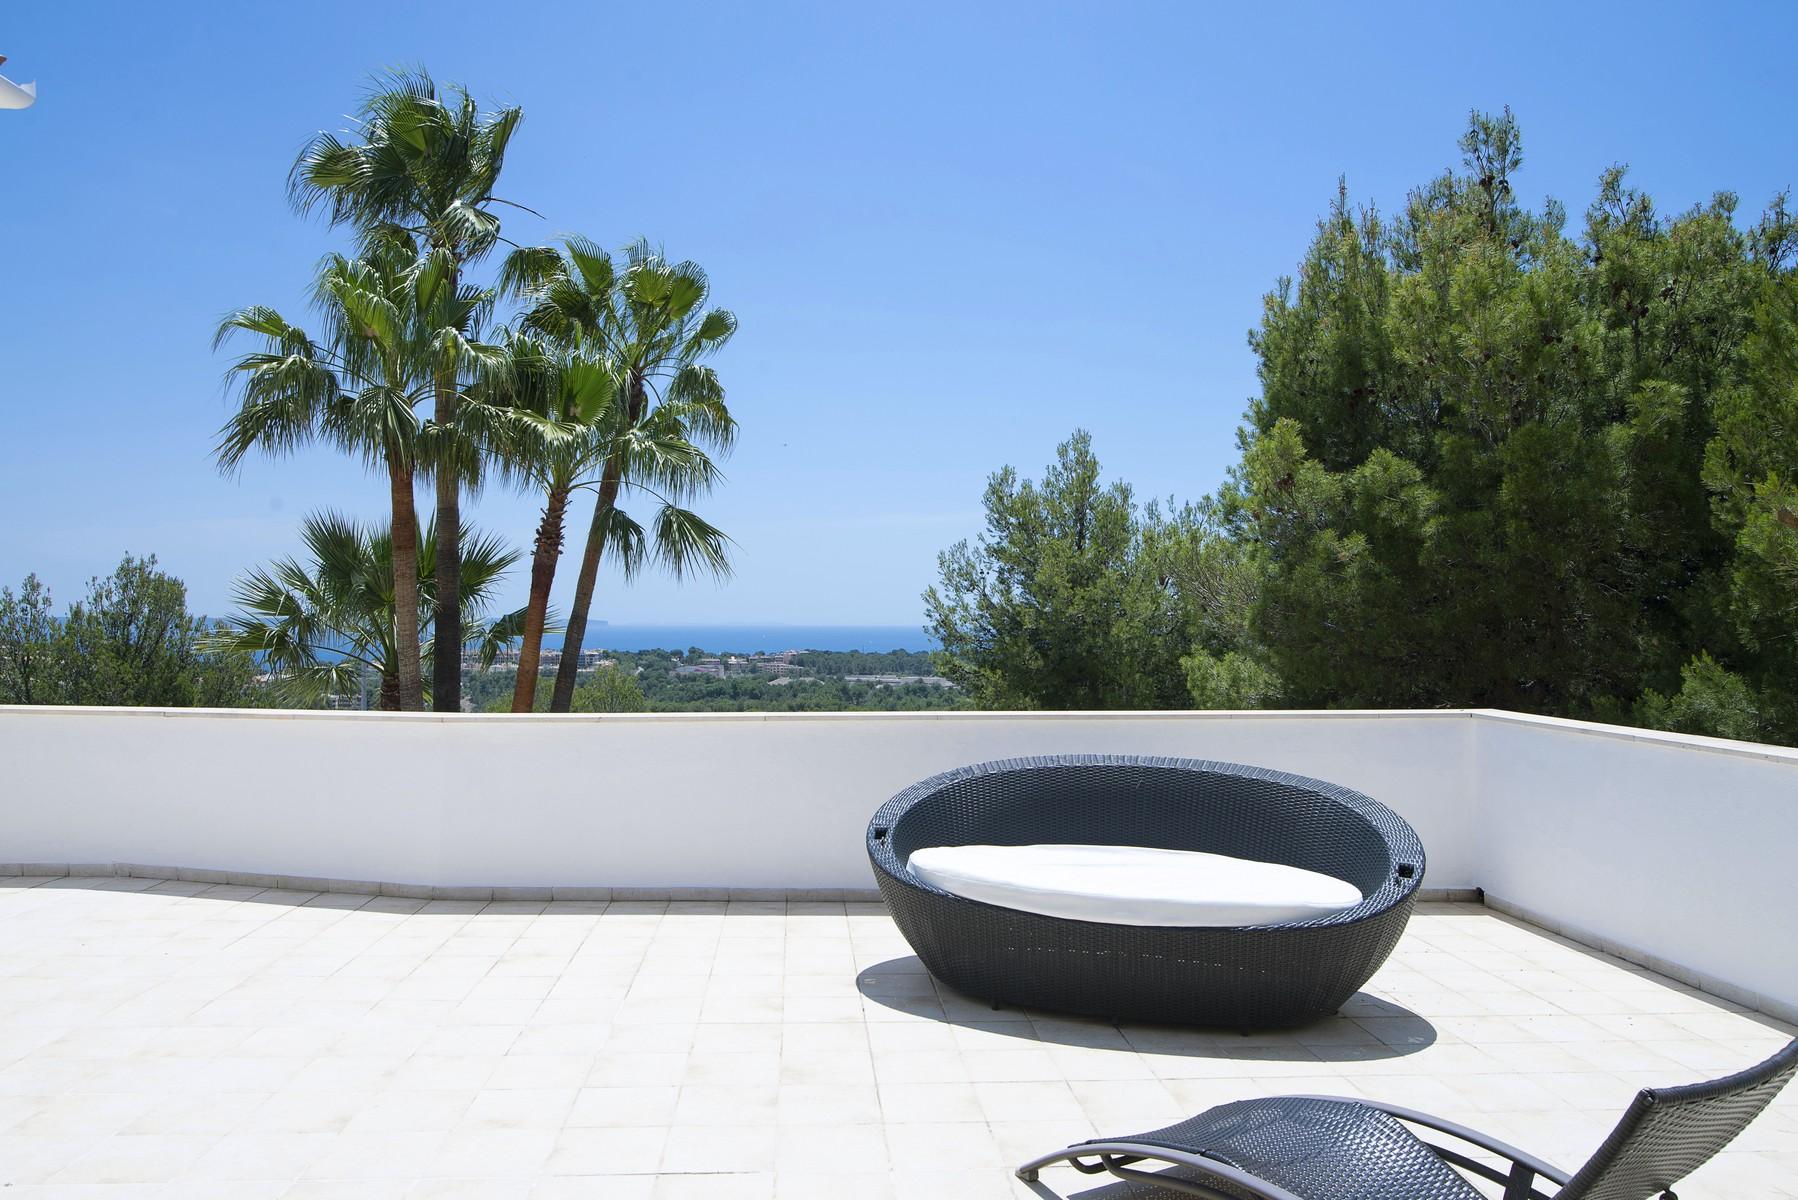 Casa Unifamiliar por un Venta en Villa with privacy and views in Bendinat Bendinat, Mallorca, 07157 España